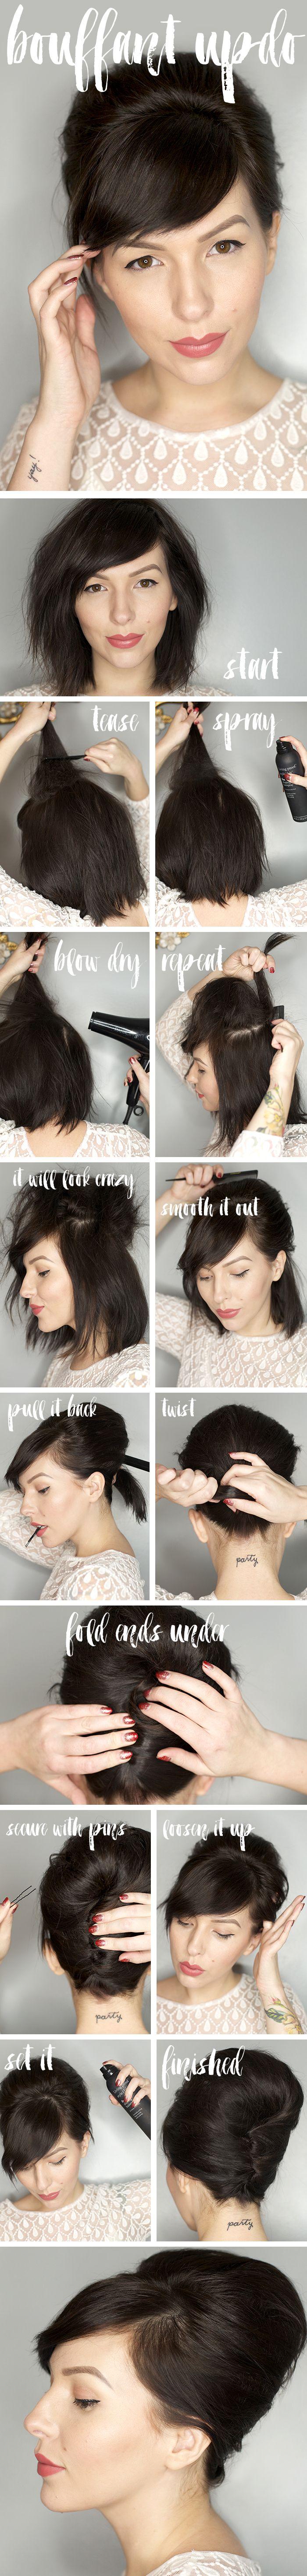 Bouffant Updo Hair Tutorial Keiko Lynn Updo Tutorials And Hair